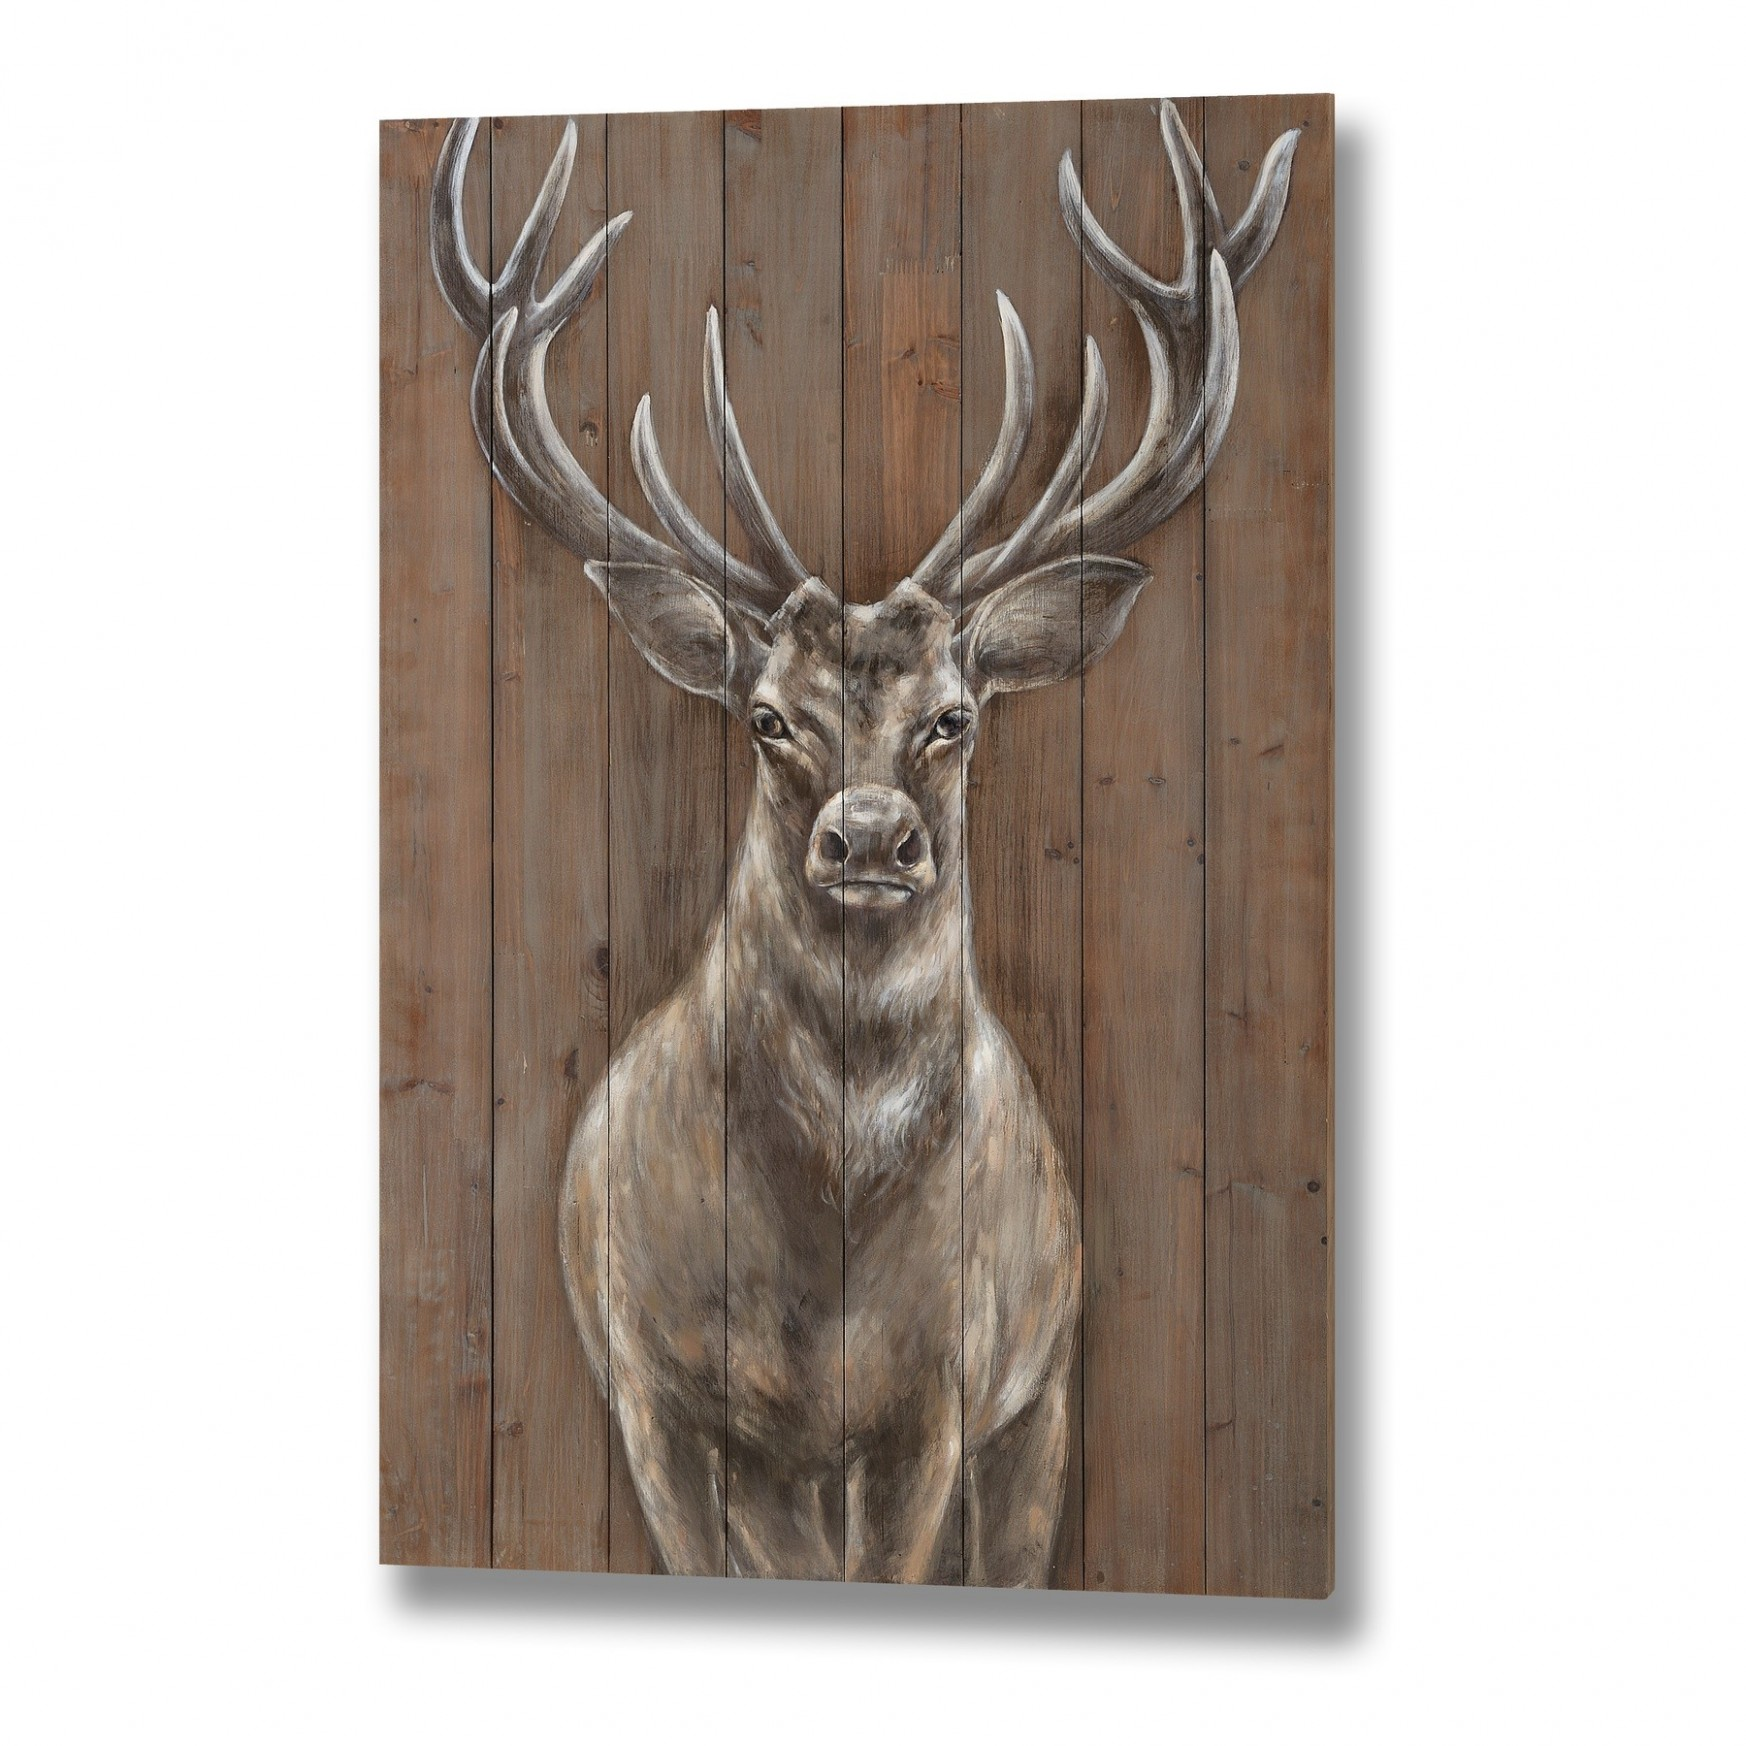 Dřevěný obraz Jelen 51x51cm - Nábytek Malvarosa | Stylový nábytek a ...